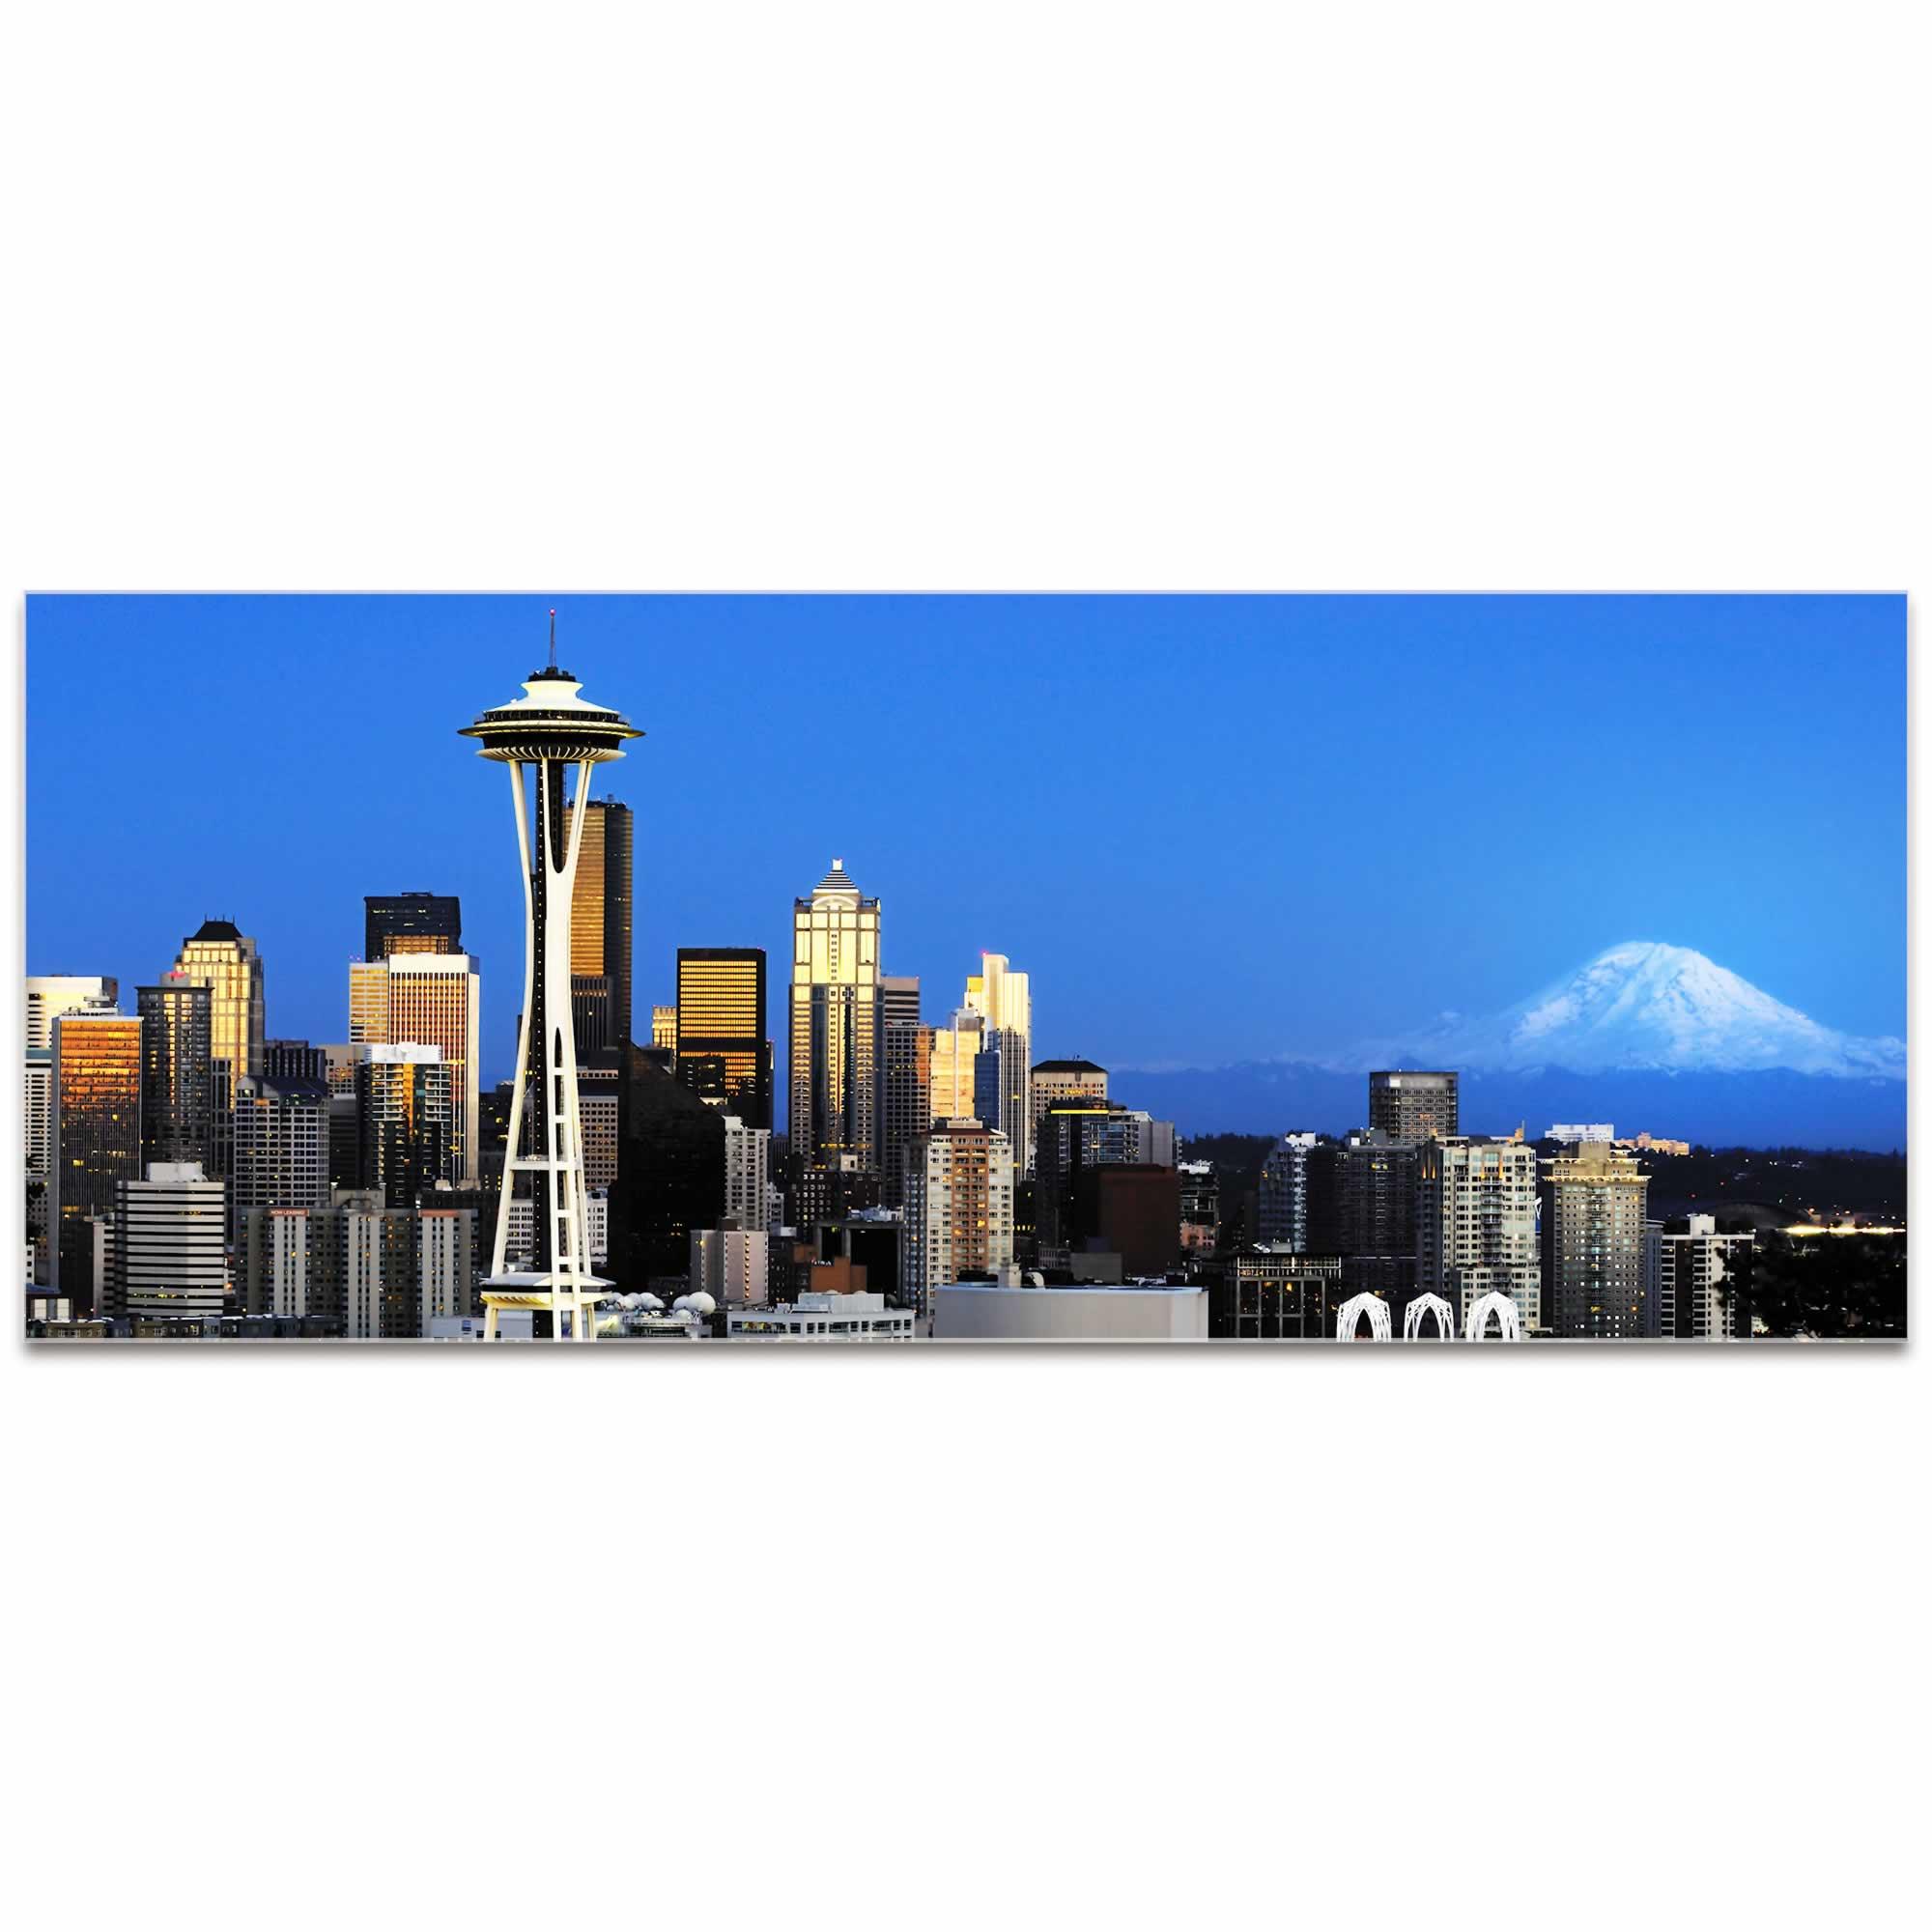 Seattle City Skyline - Urban Modern Art, Designer Home Decor, Cityscape Wall Artwork, Trendy Contemporary Art